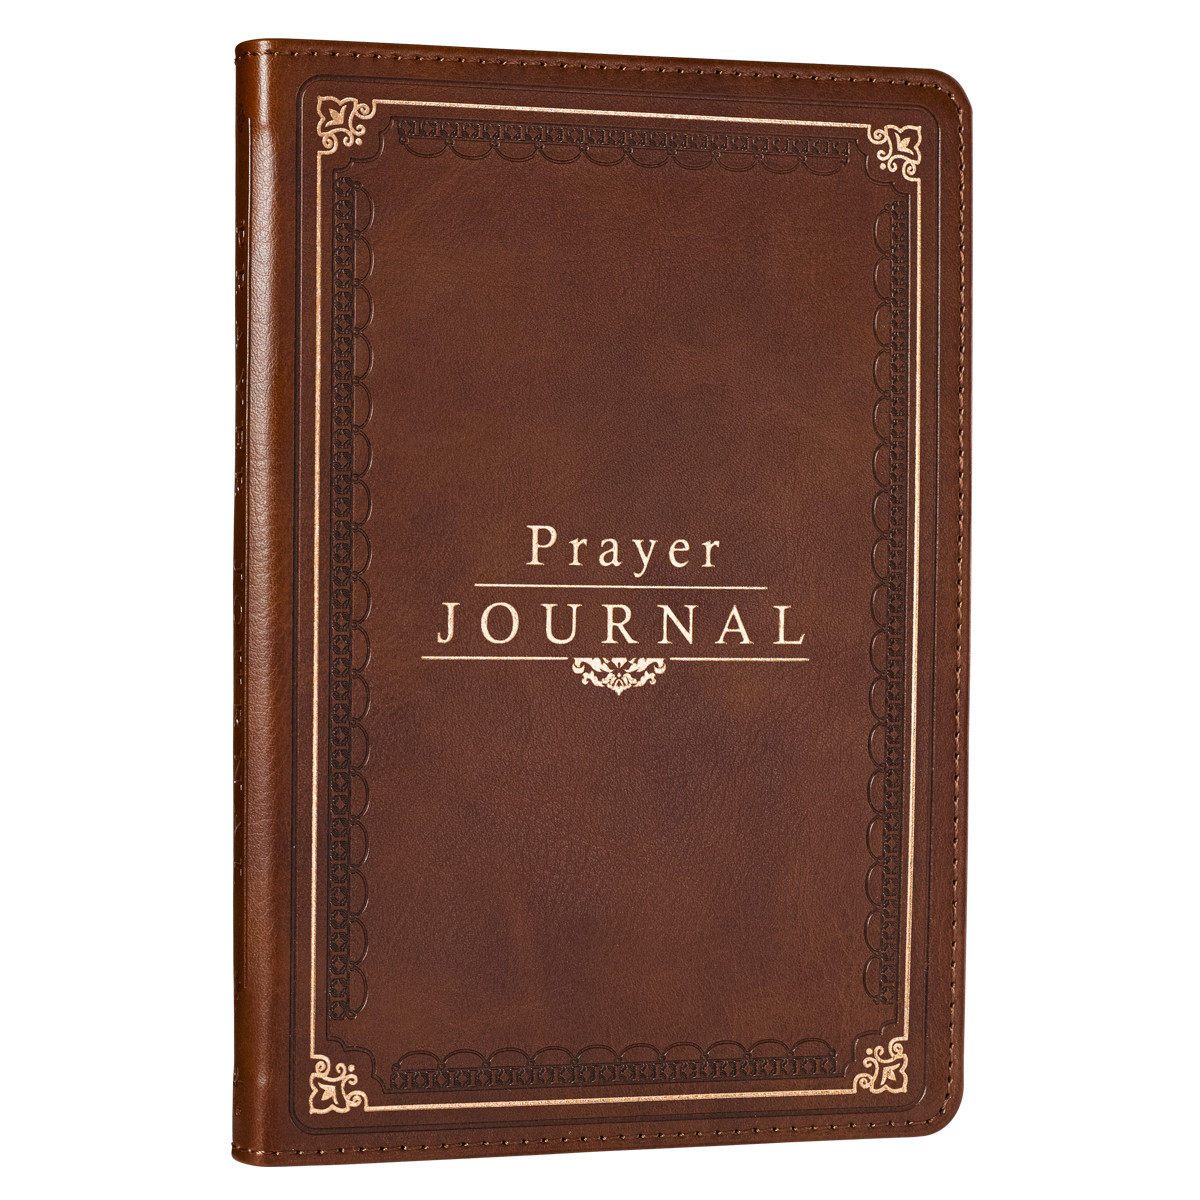 Prayer Journal journal, prayer journal, written journal,writing journal, personal gift, JLP020